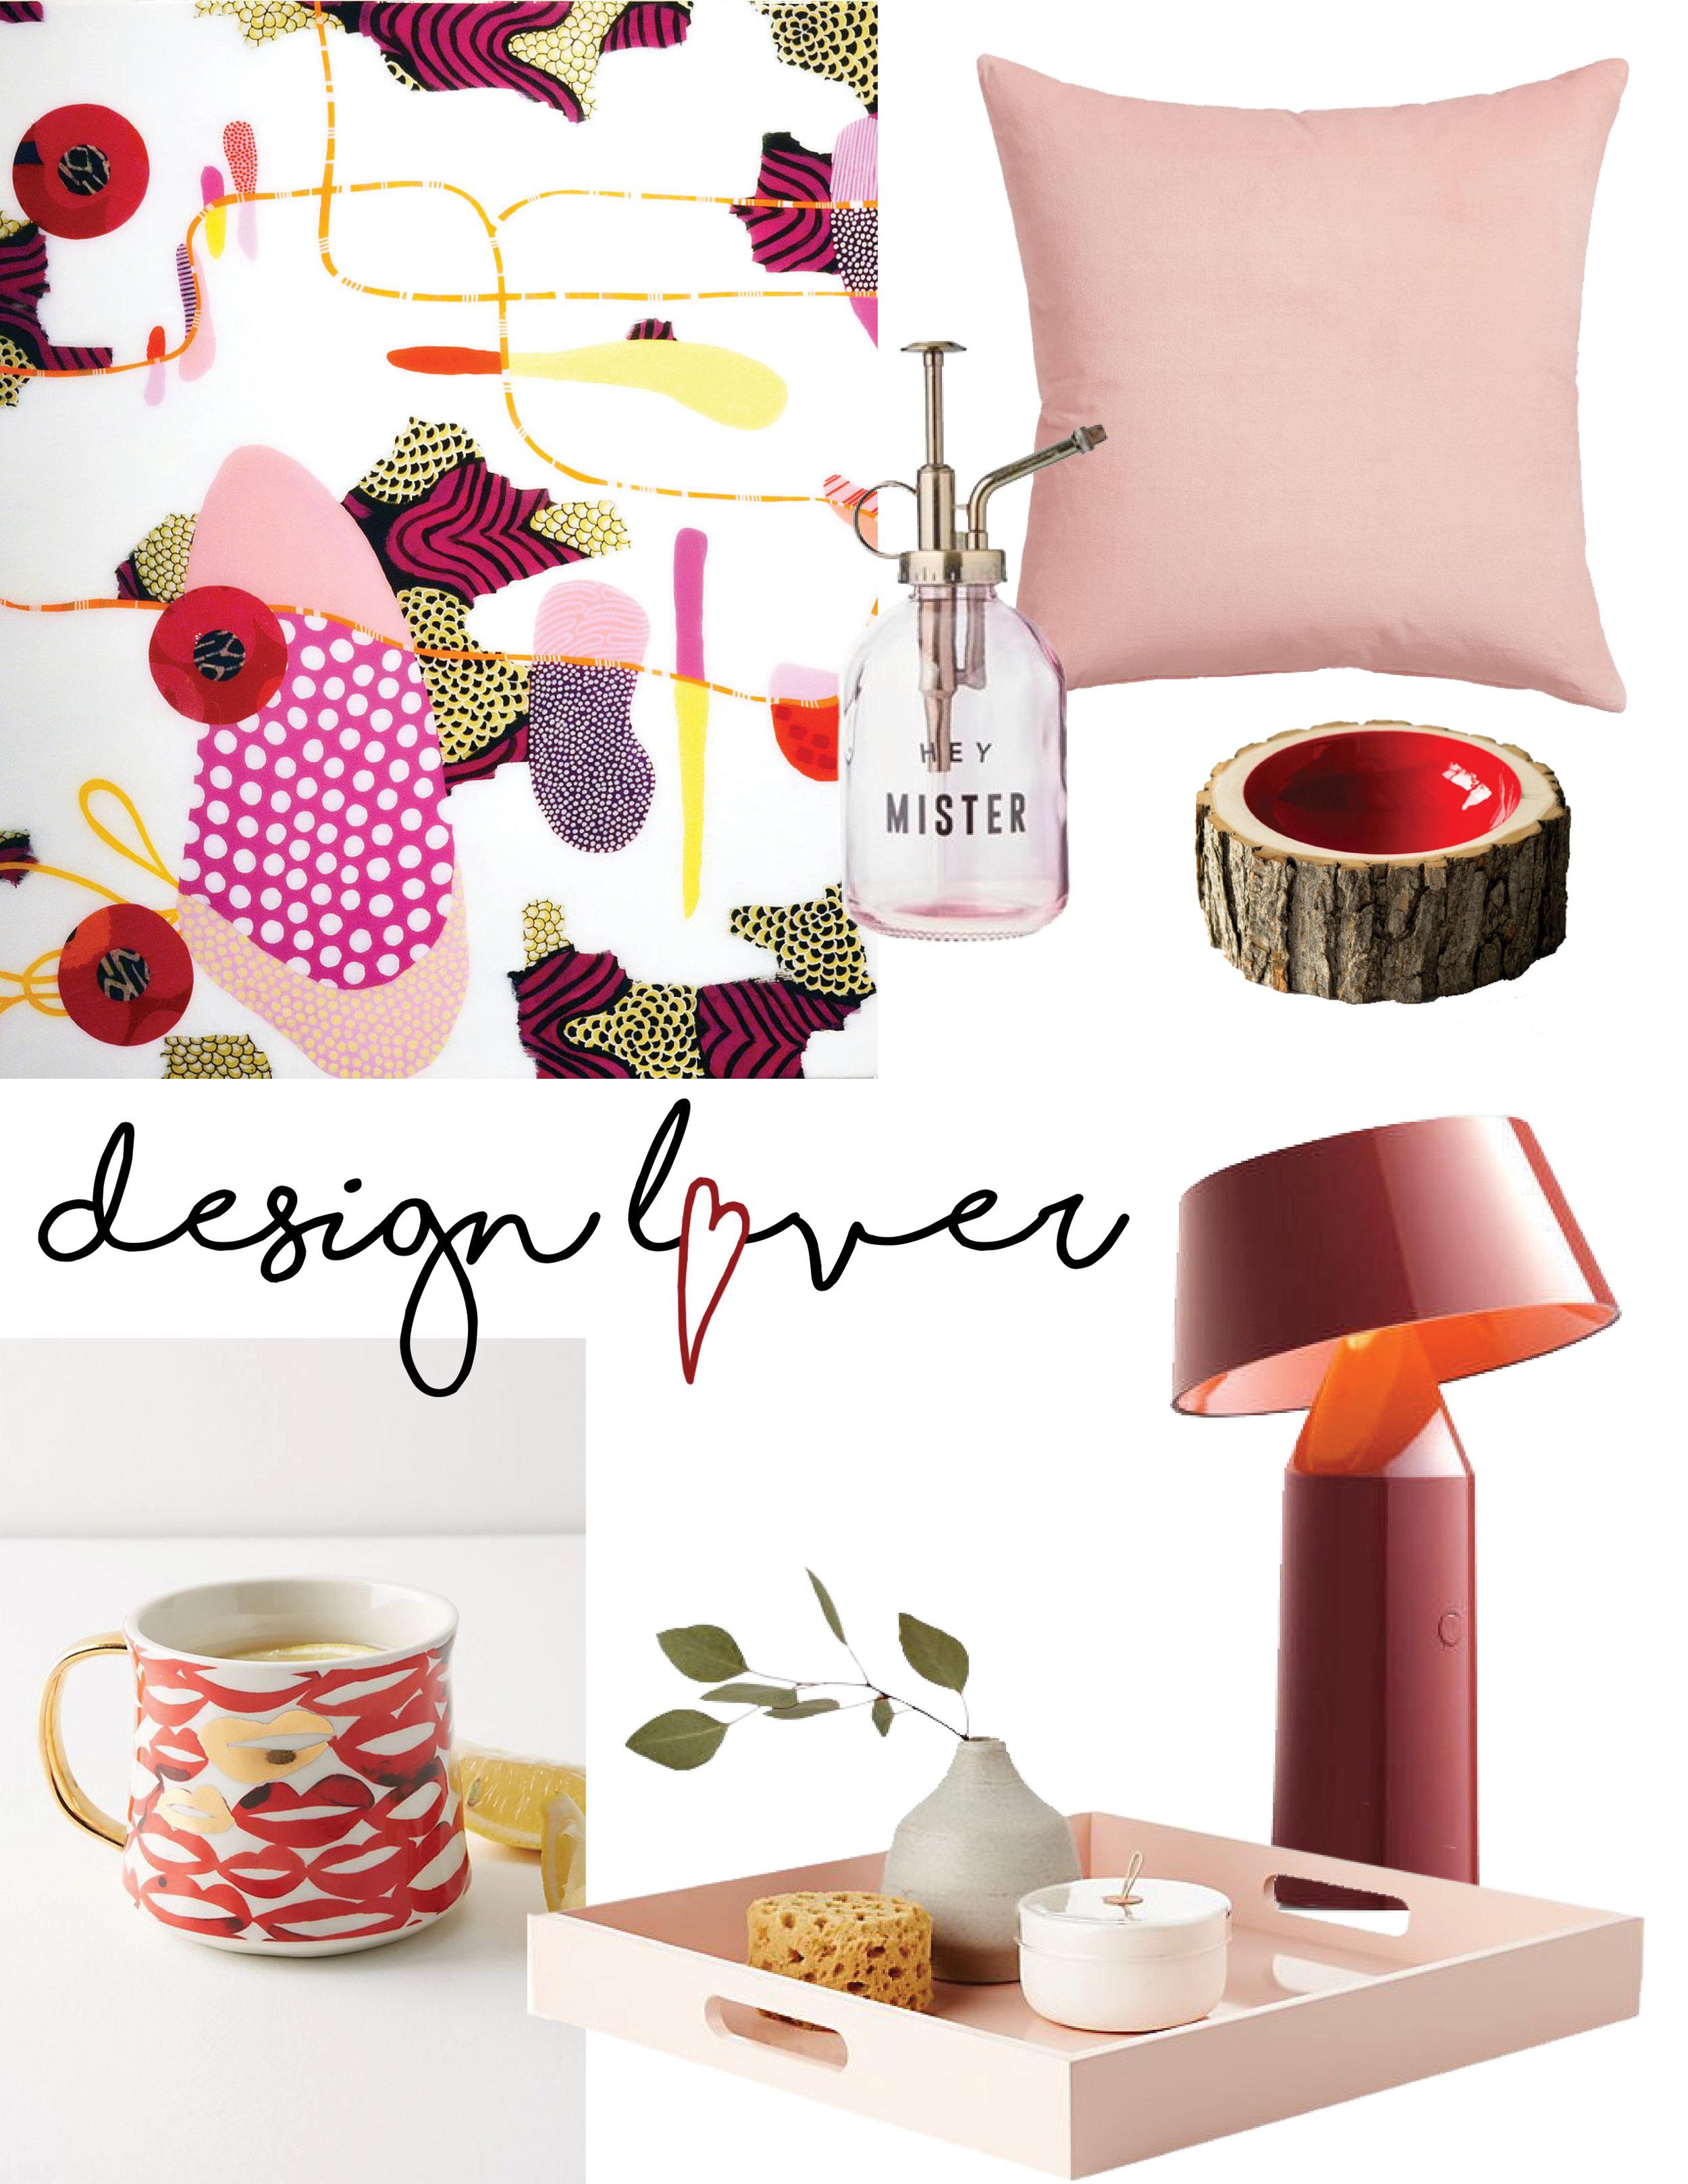 Valentine's Day, Gift Ideas for the Design Lover, Nyla Free Designs, Calgary Interior Designer